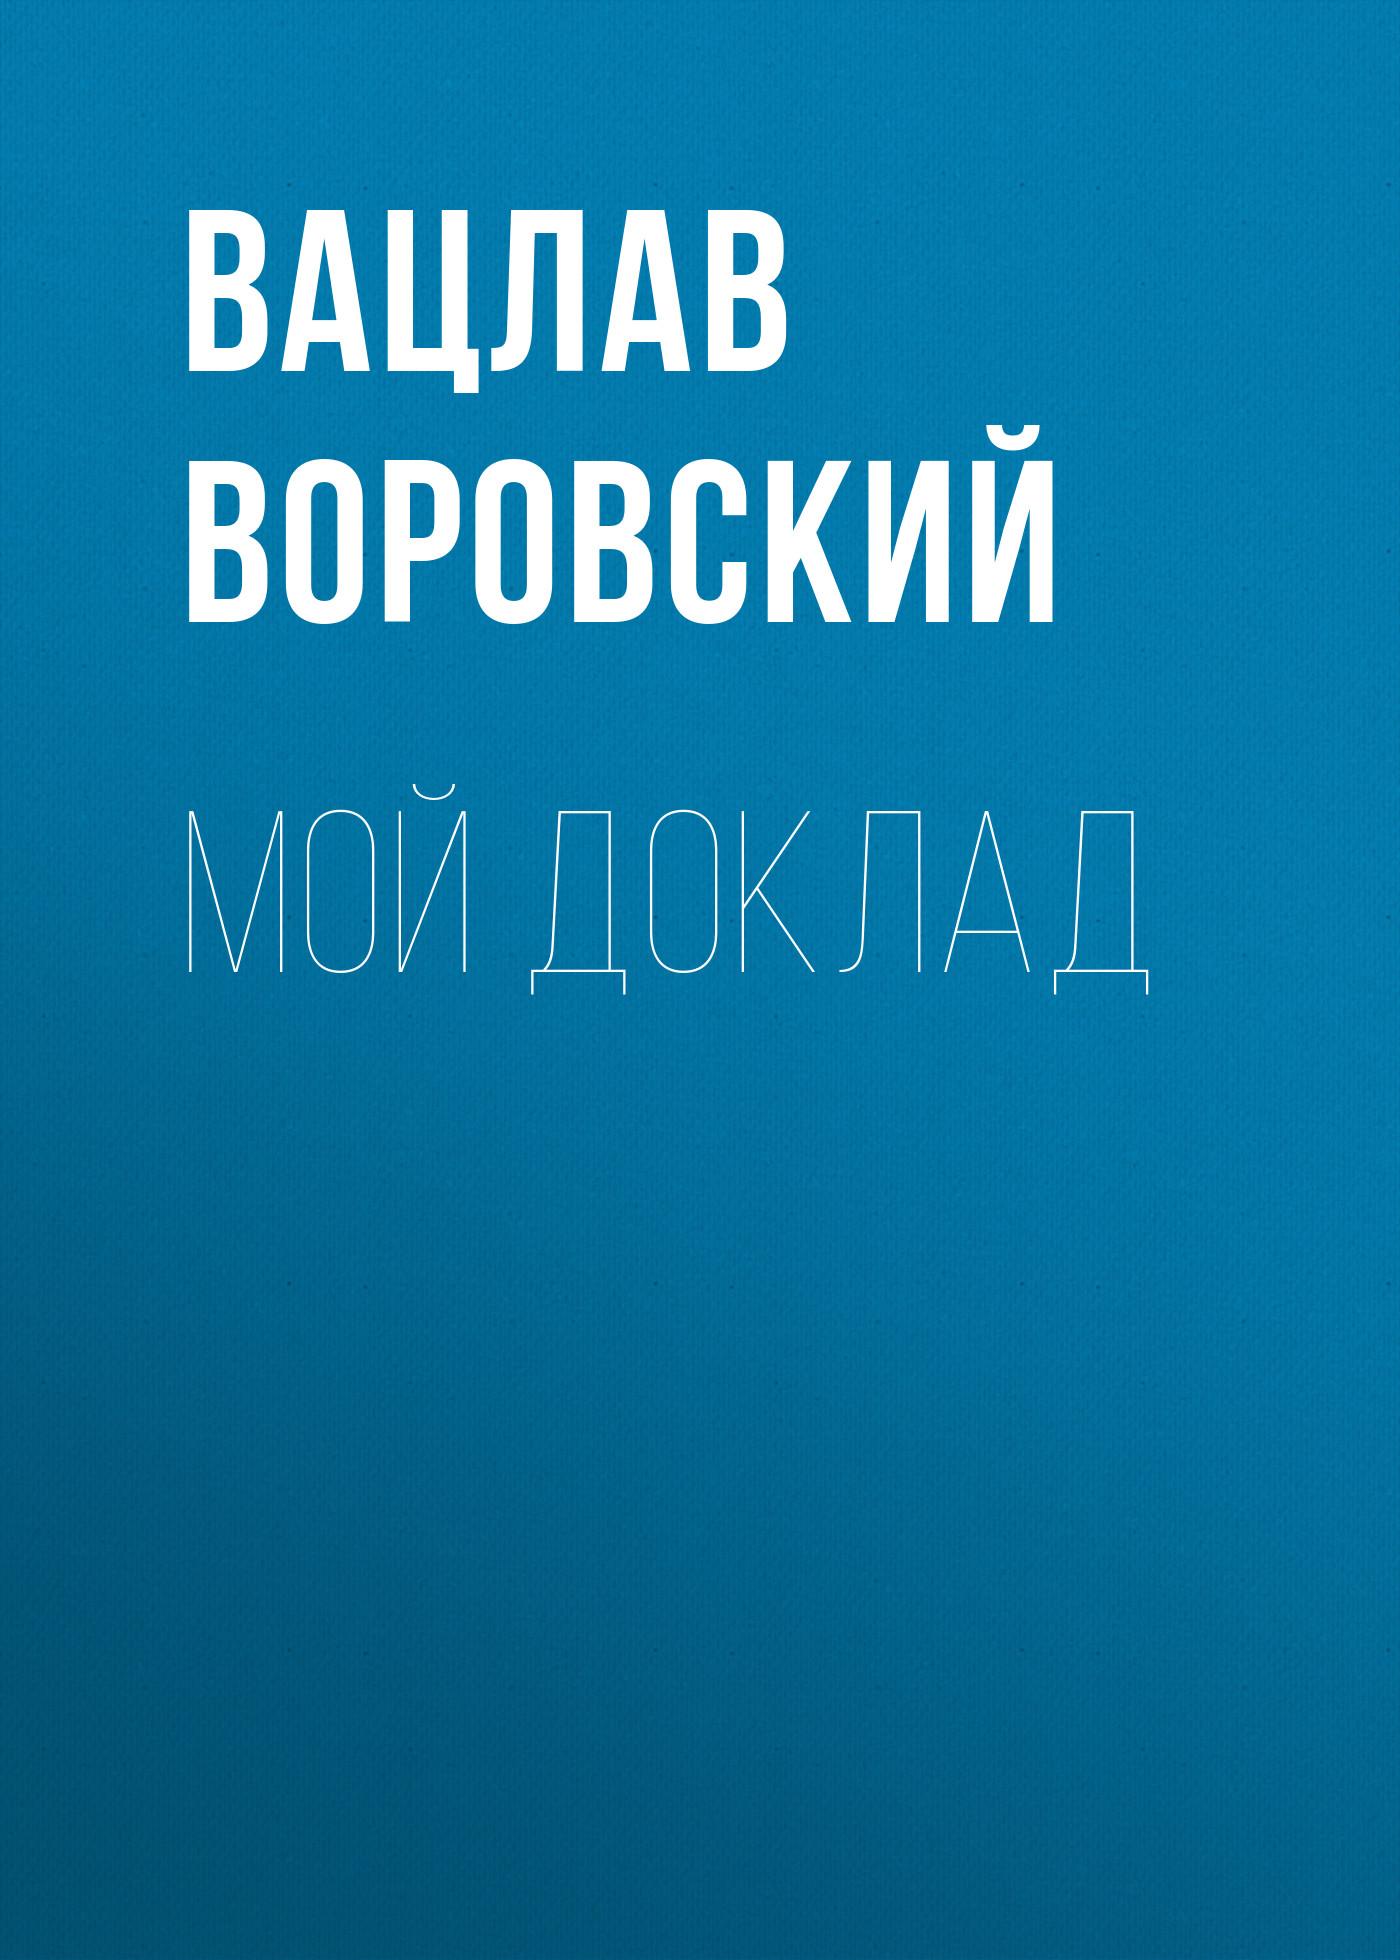 Вацлав Воровский Мой доклад вацлав воровский цыпочка